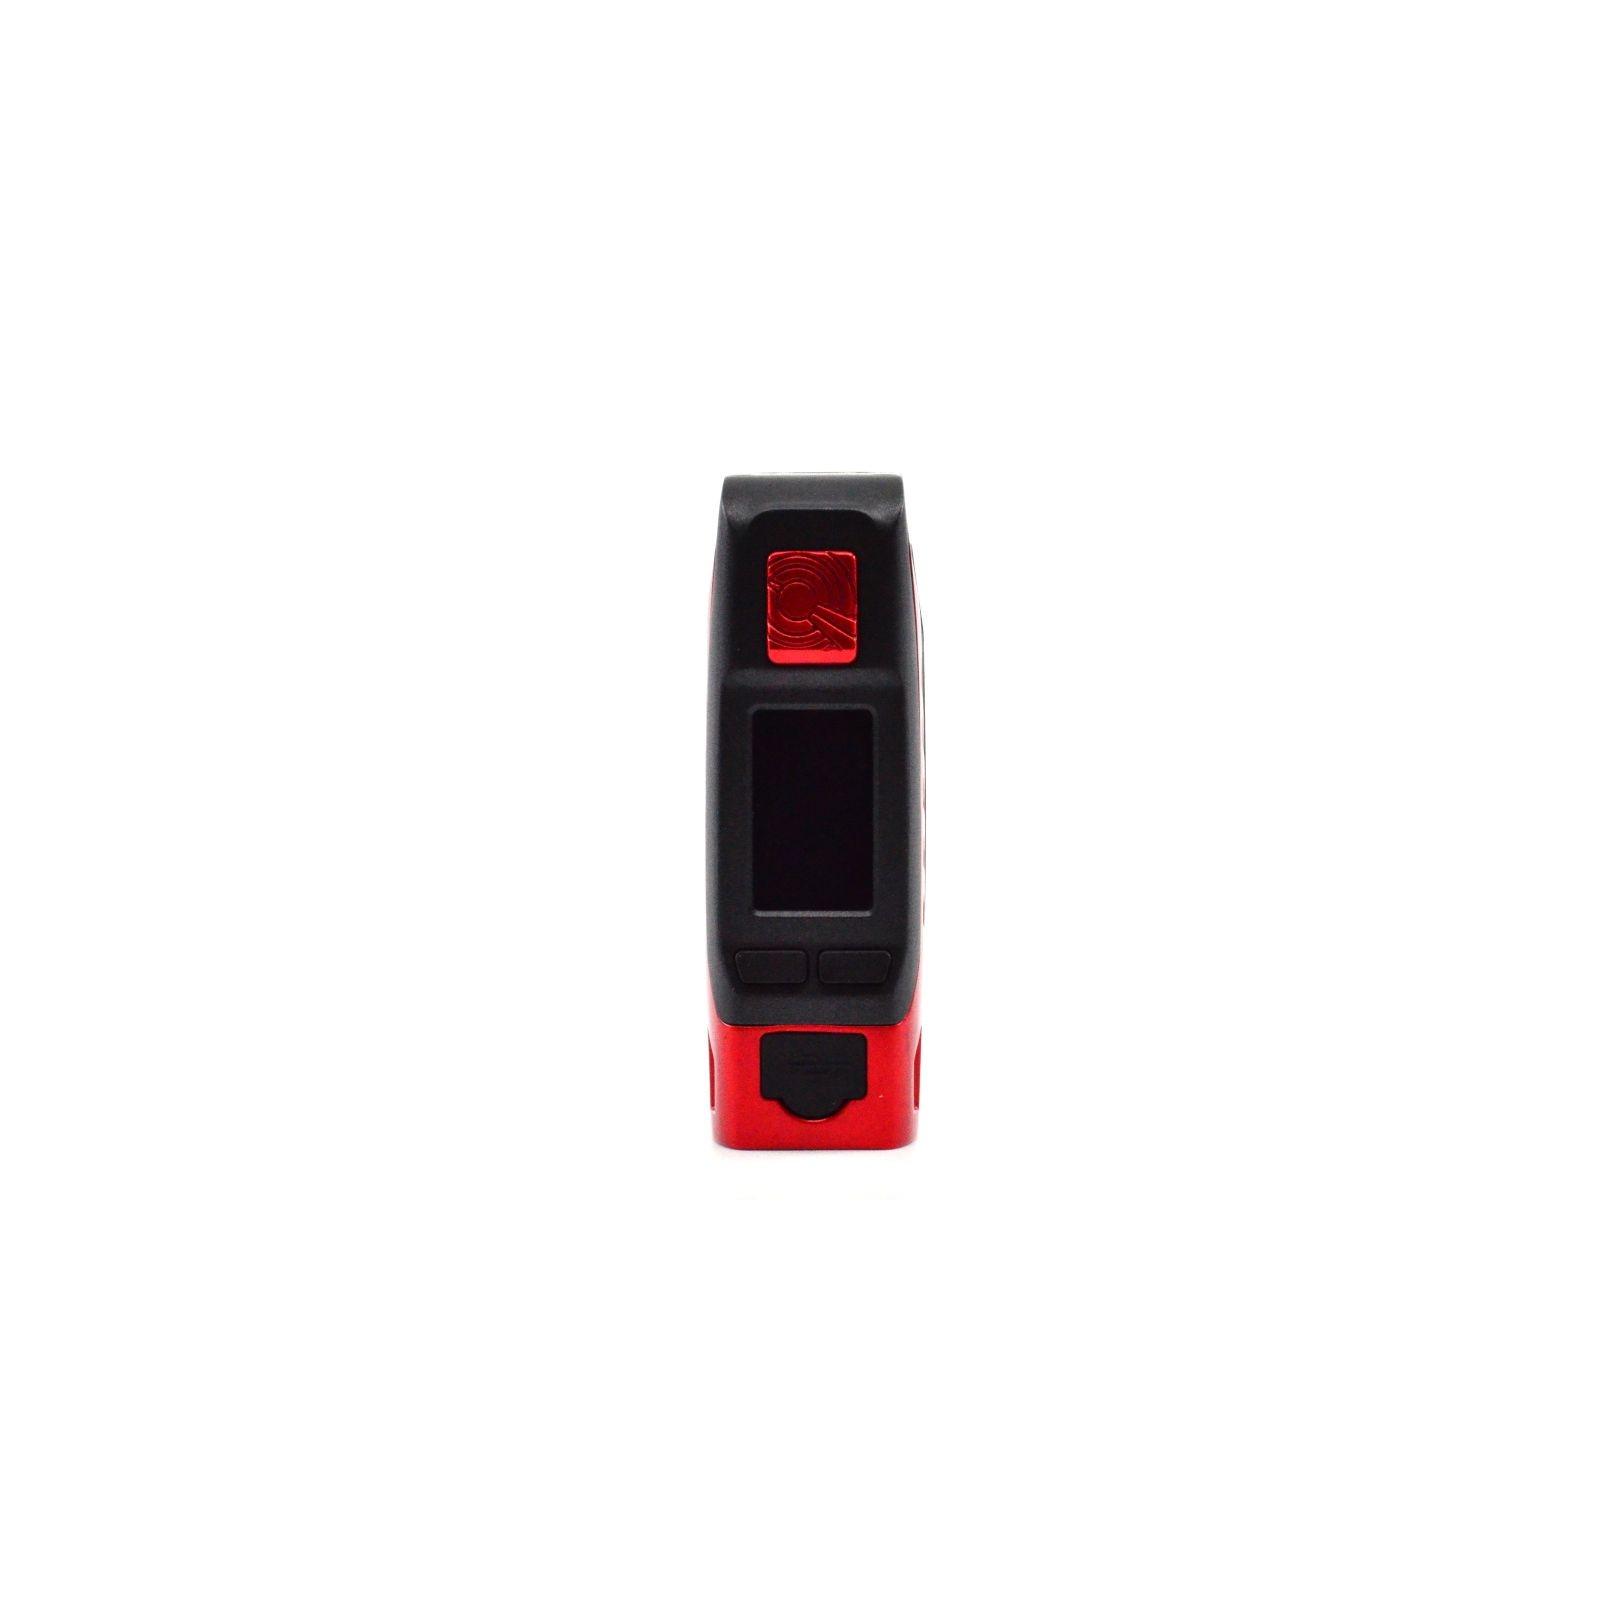 Box Reuleaux Tinker 2 - Wismec